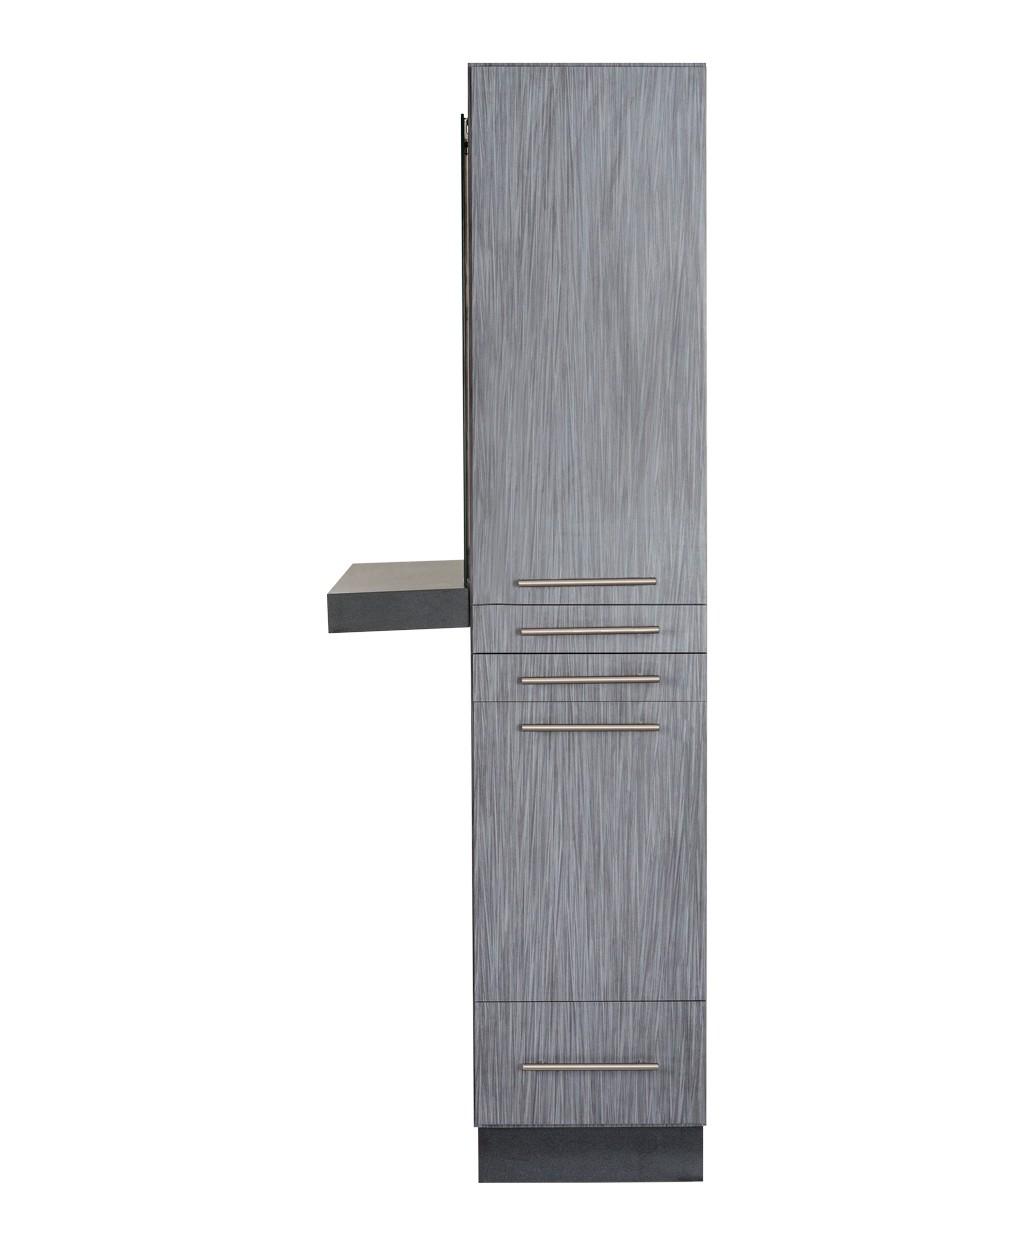 Maxim Styling Station w/ Ledge